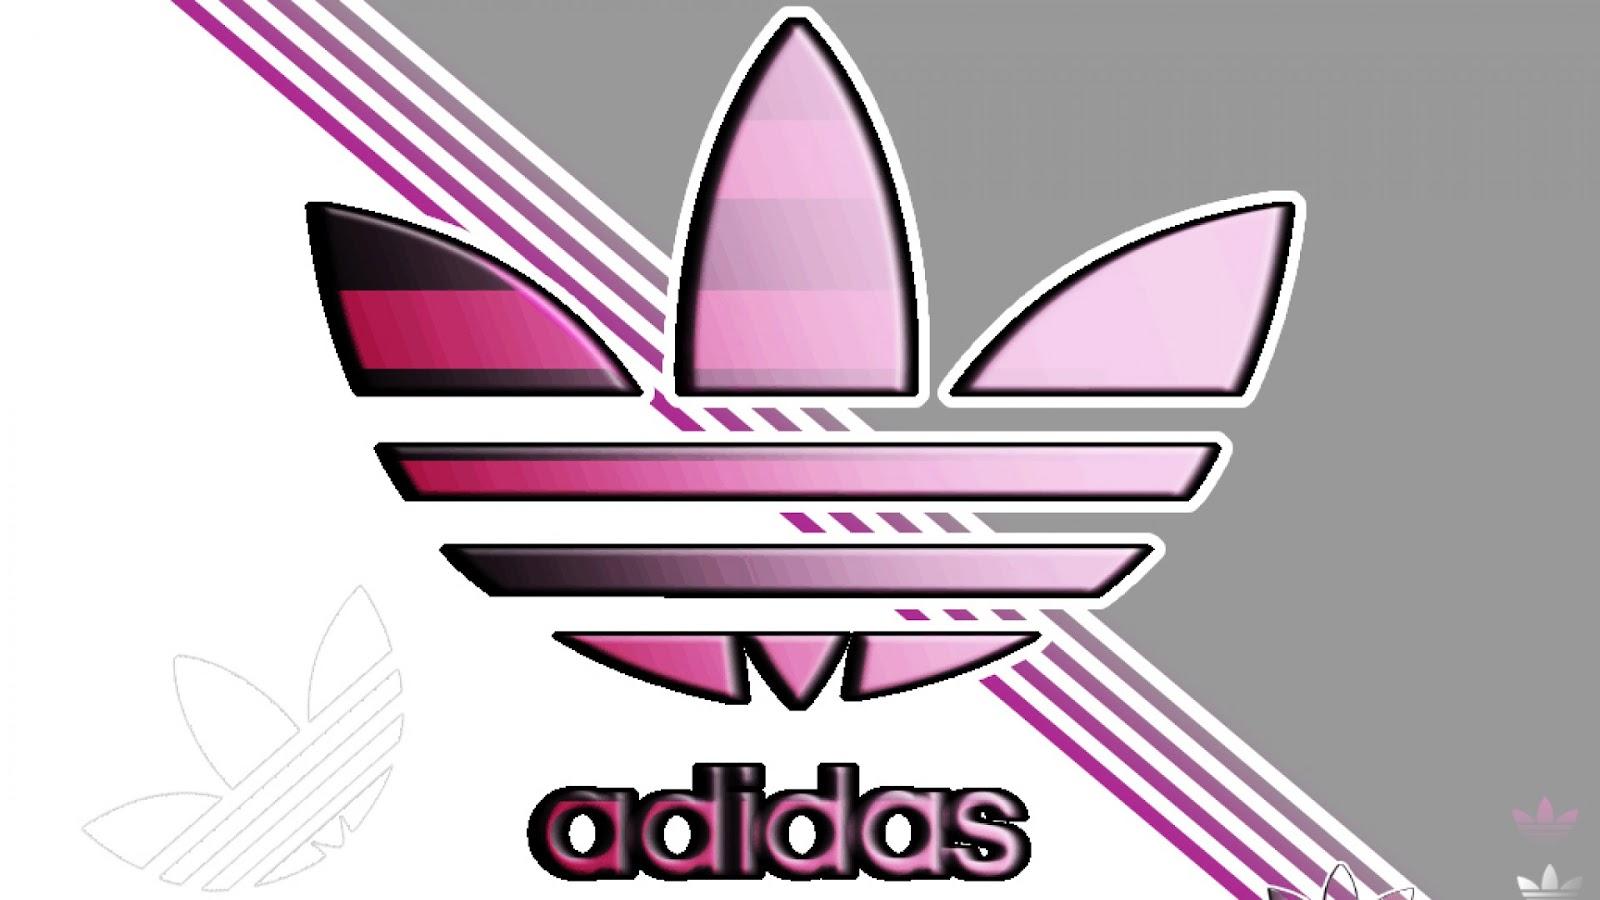 Adidas Logo Wallpaper 5836 Hd Wallpapers in Logos   Imagescicom 1600x900